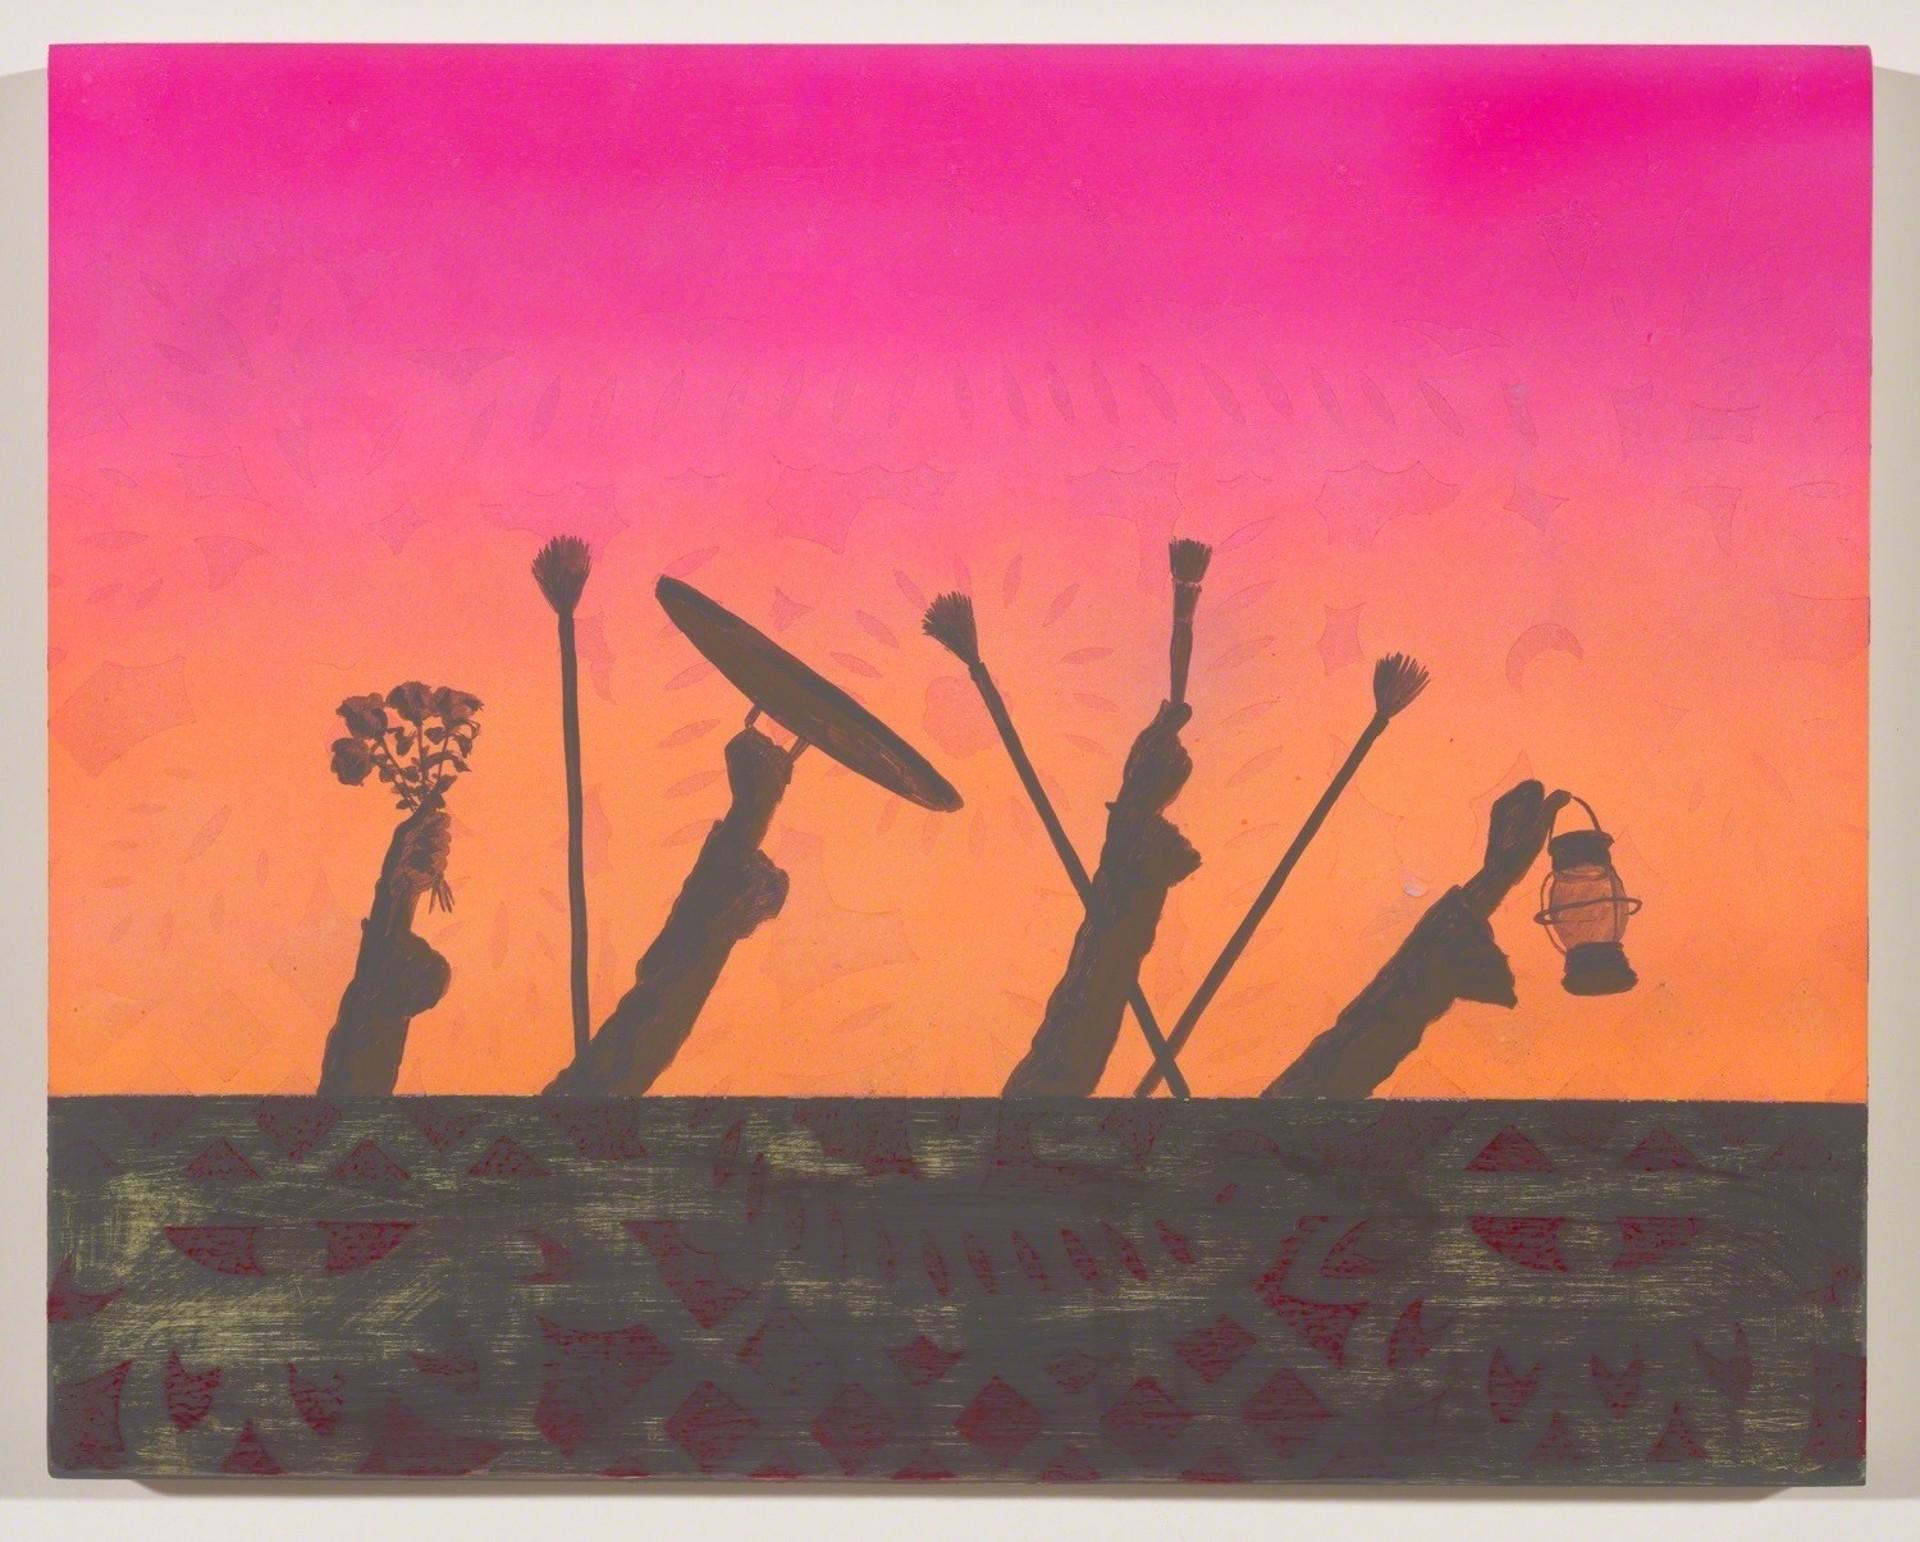 Sunset Wall Mob by Vonn Cummings Sumner